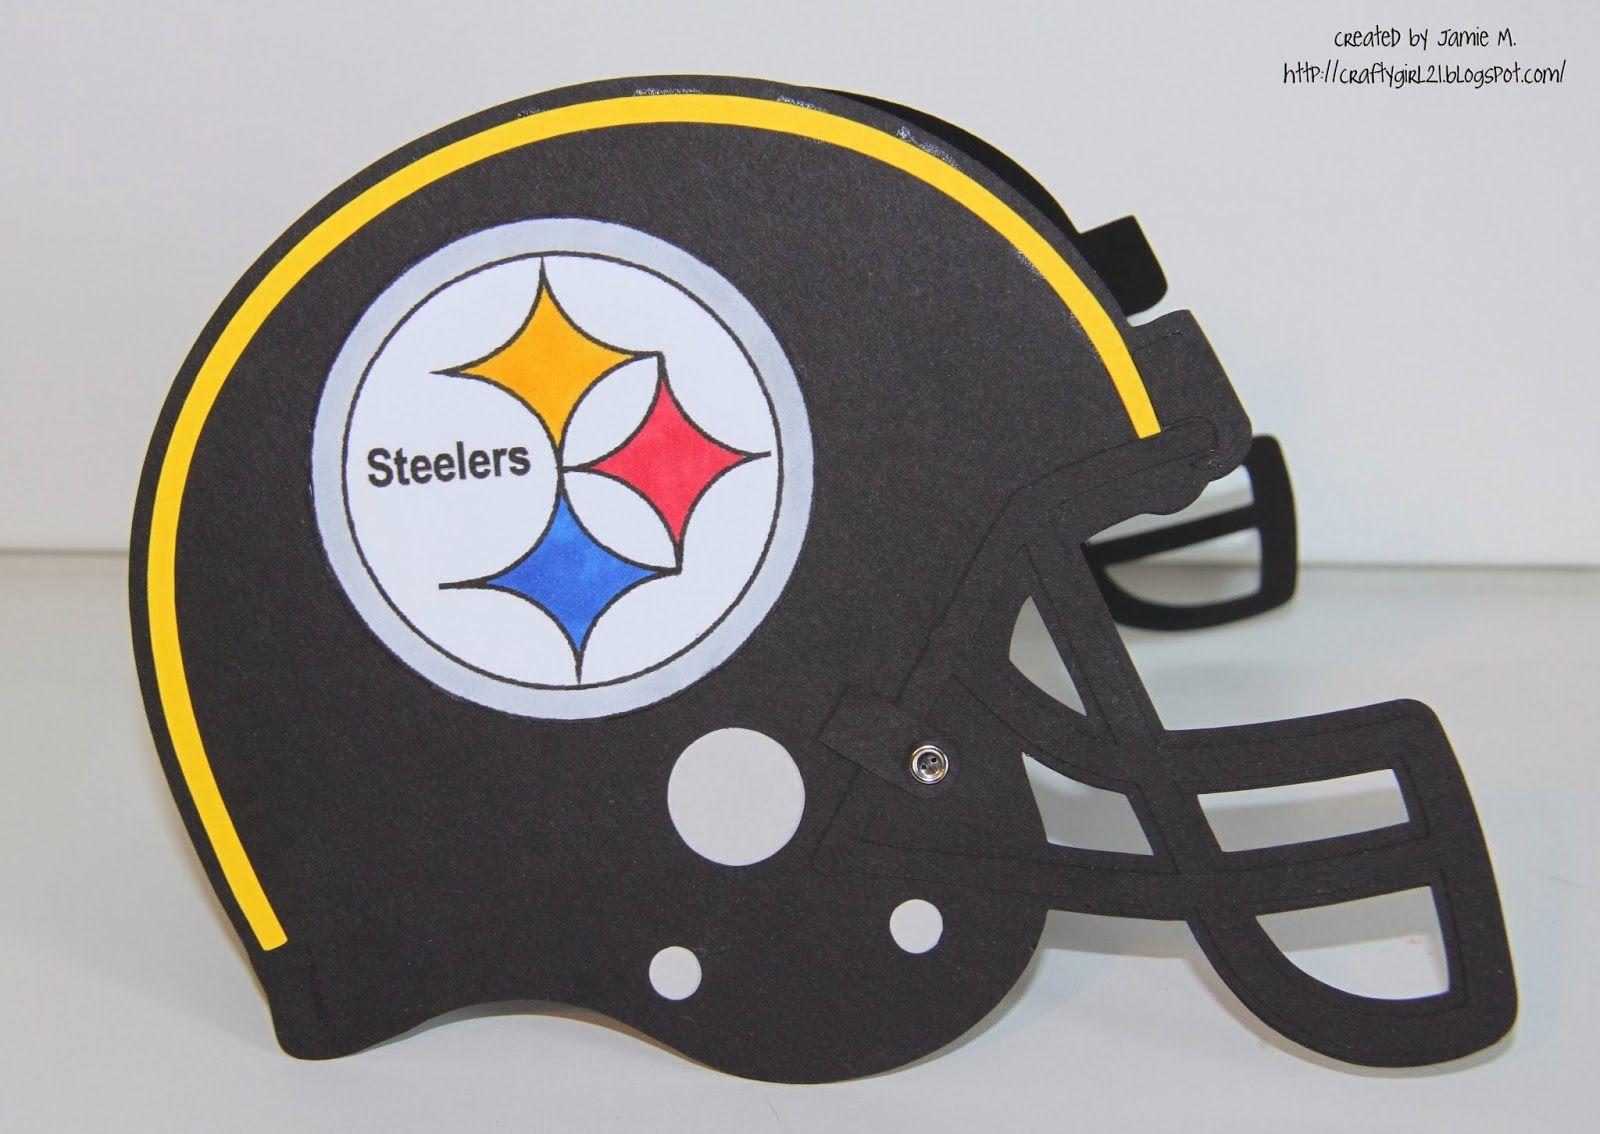 Steelers Helmet Card Steelers helmet, Helmet, Steelers